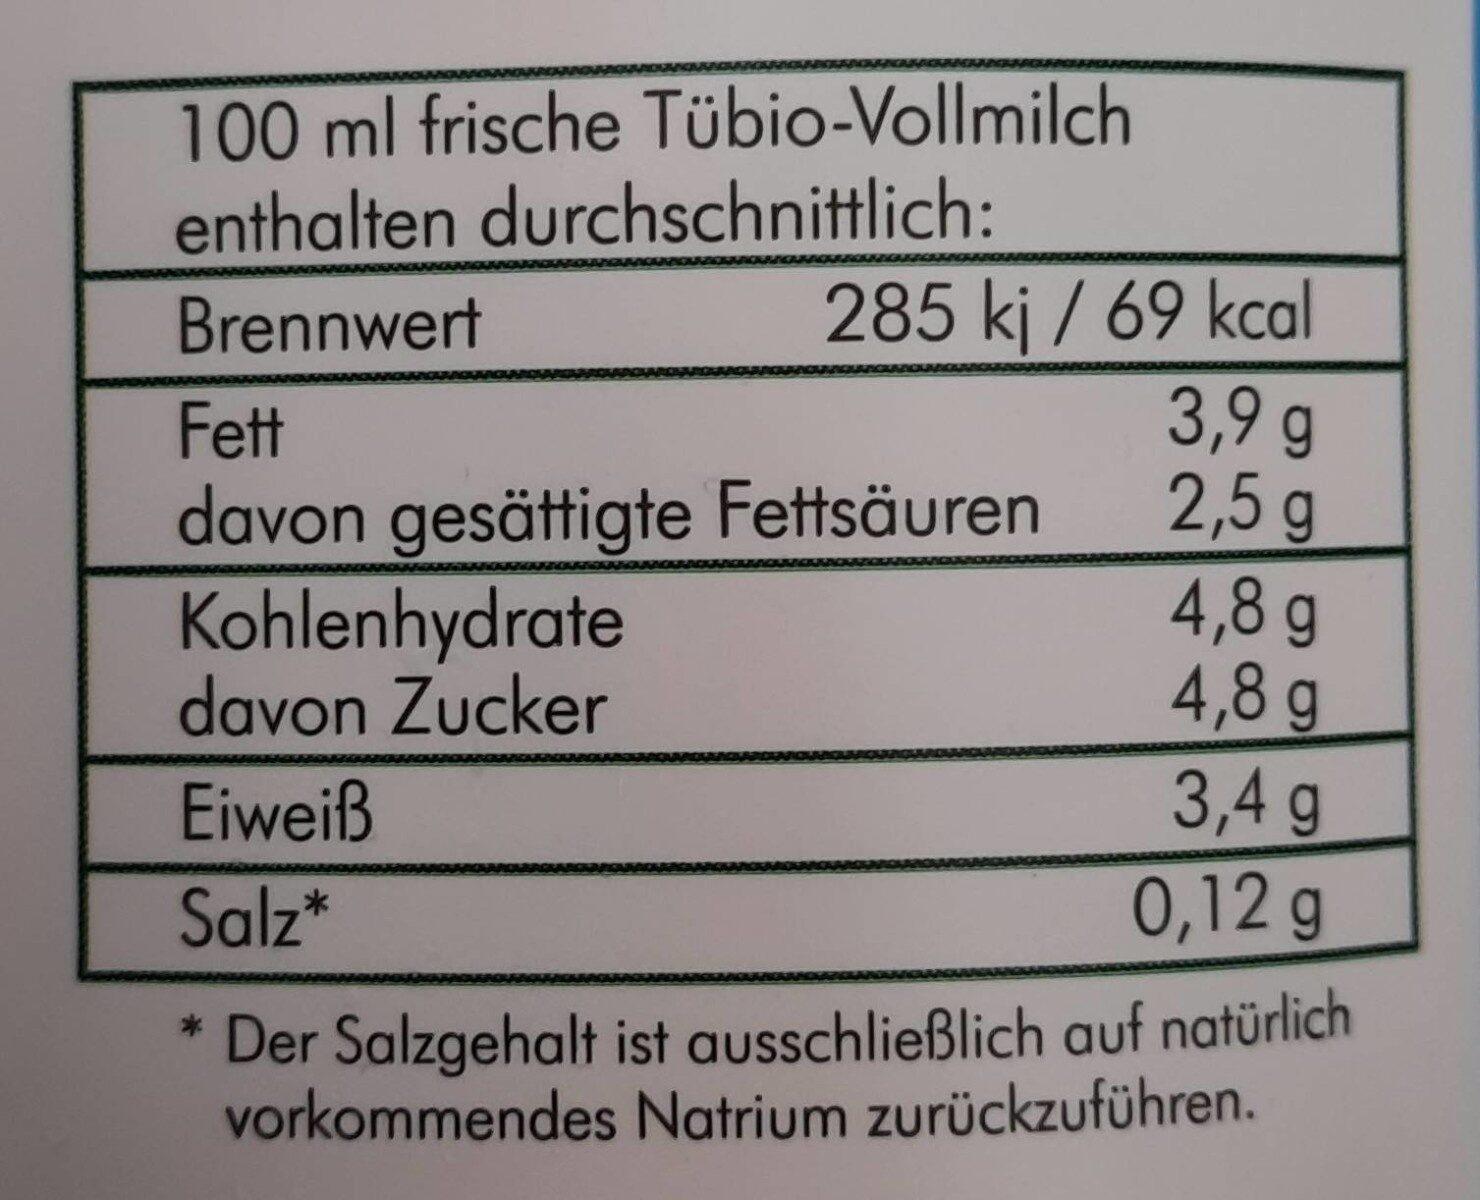 Frische Tübinger Vollmilch - Valori nutrizionali - de